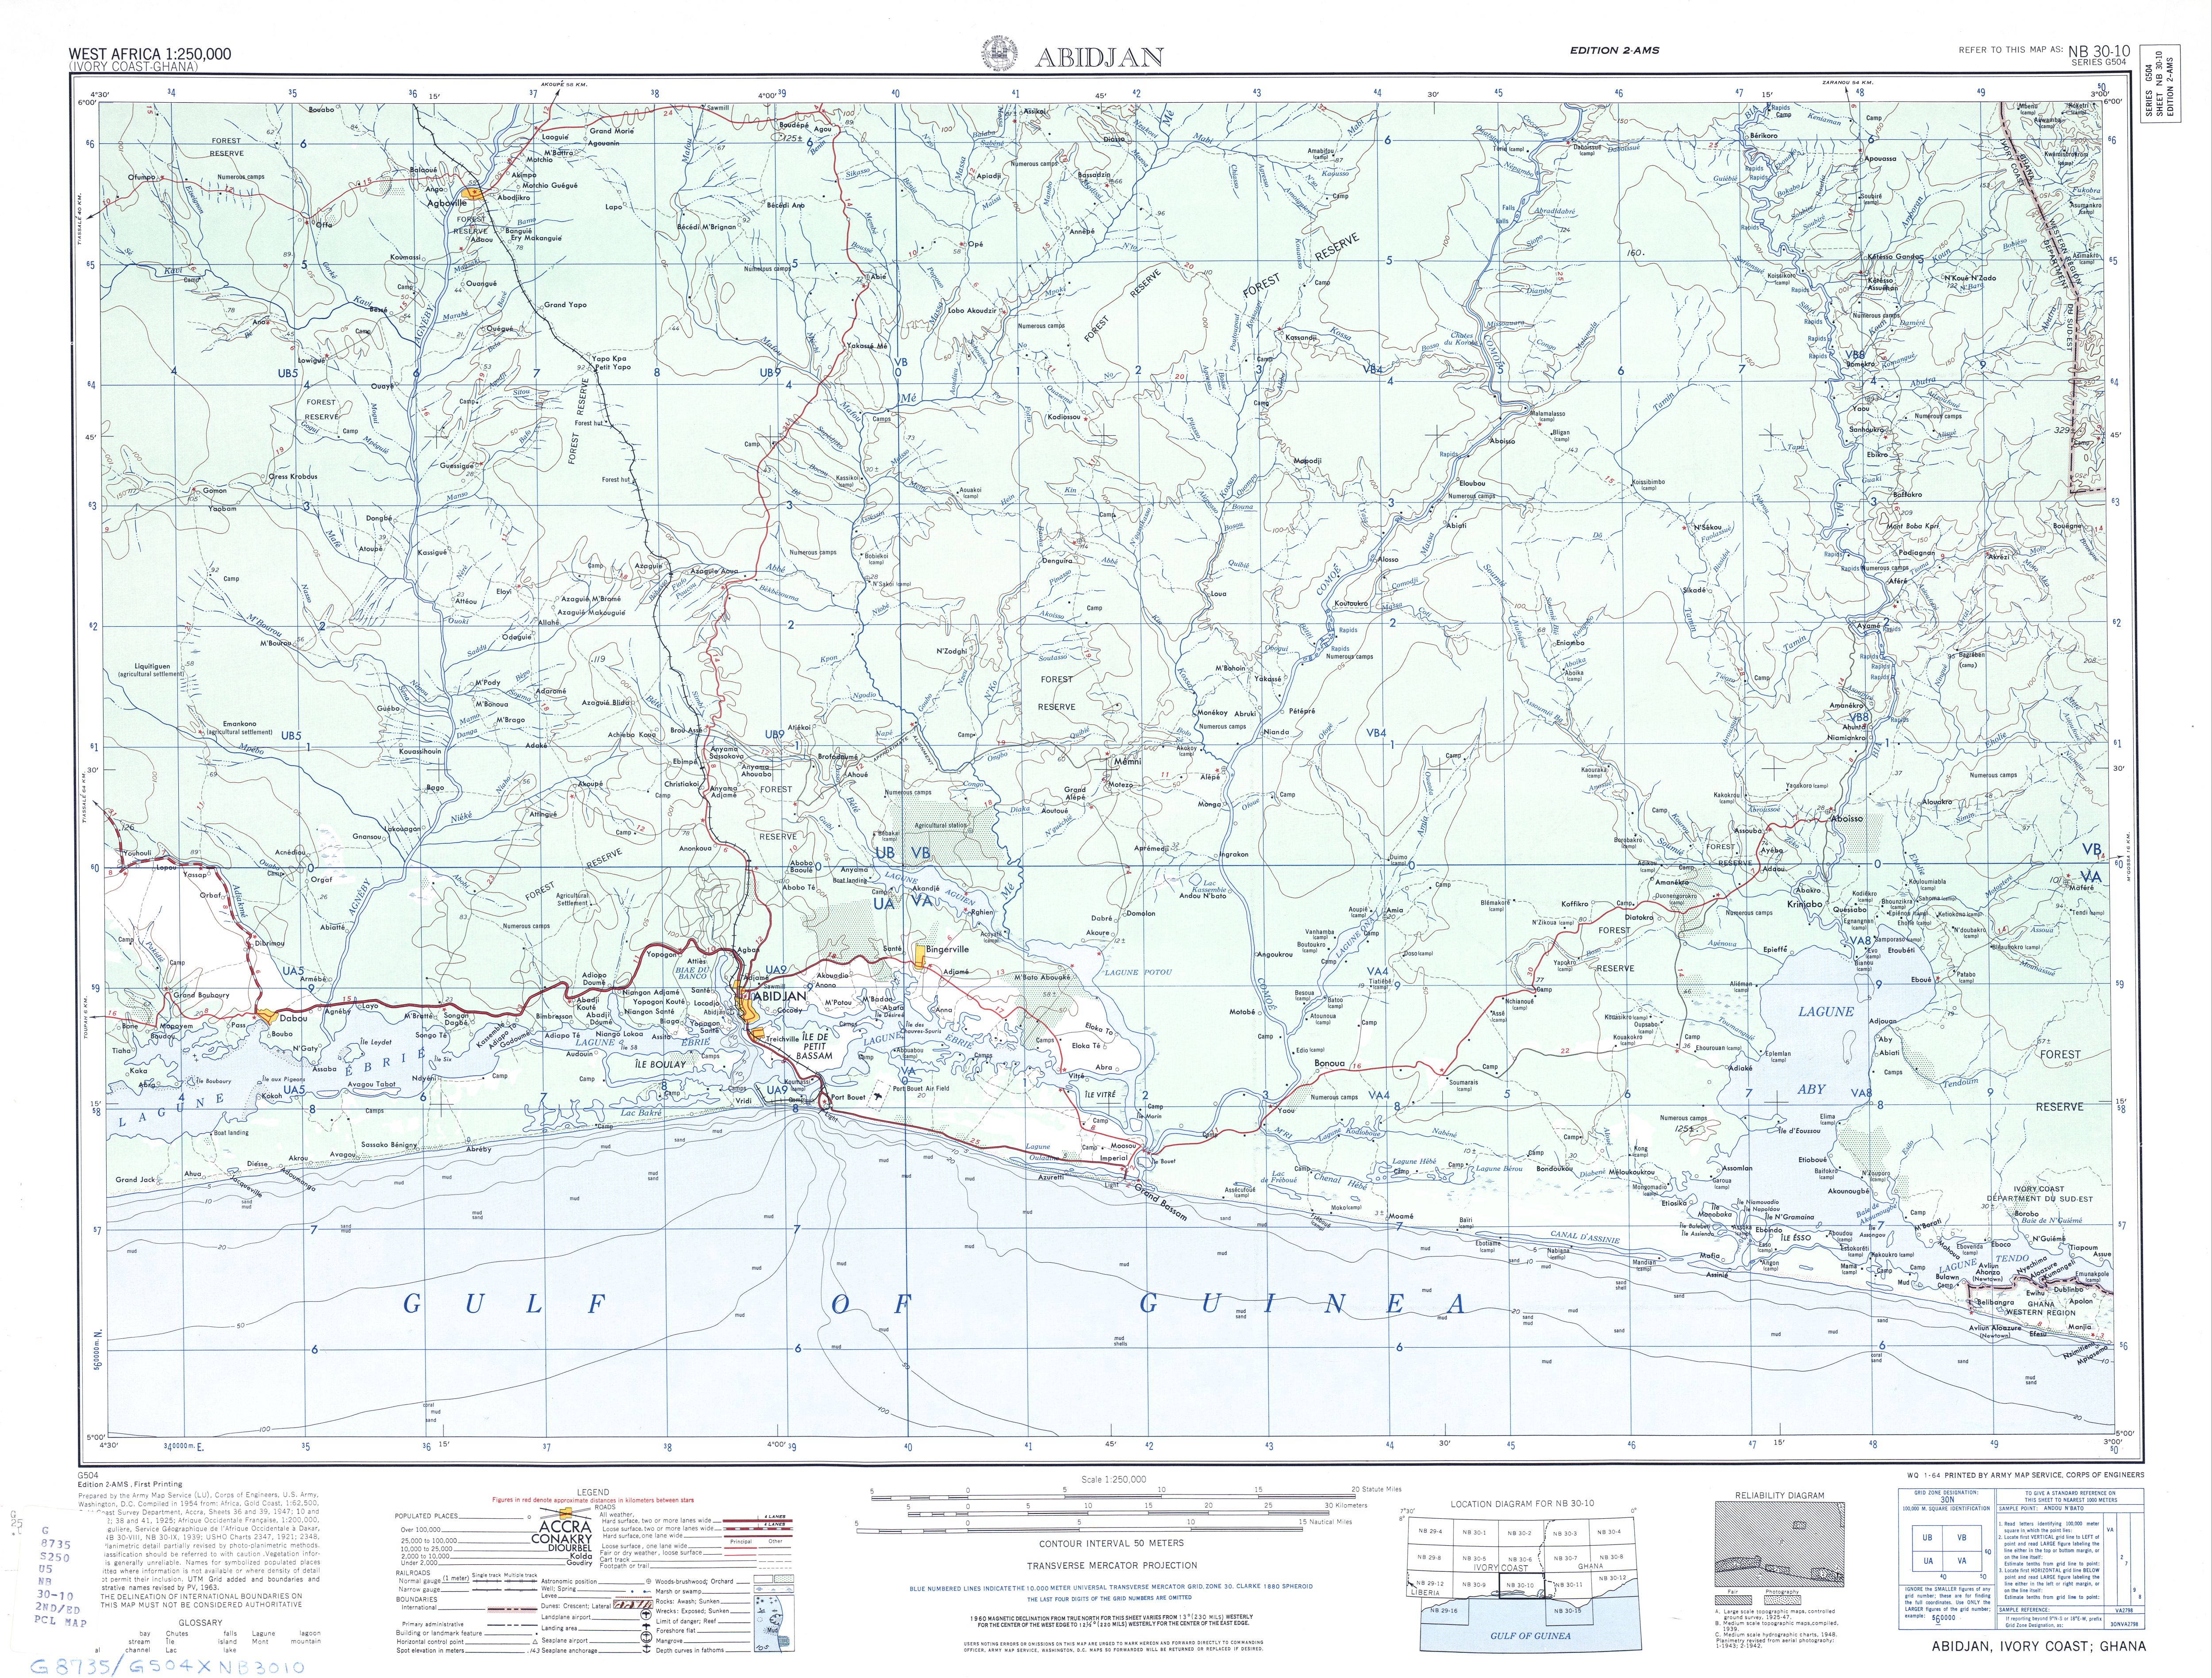 Hoja Abiyán del Mapa Topográfico de África Occidental 1955